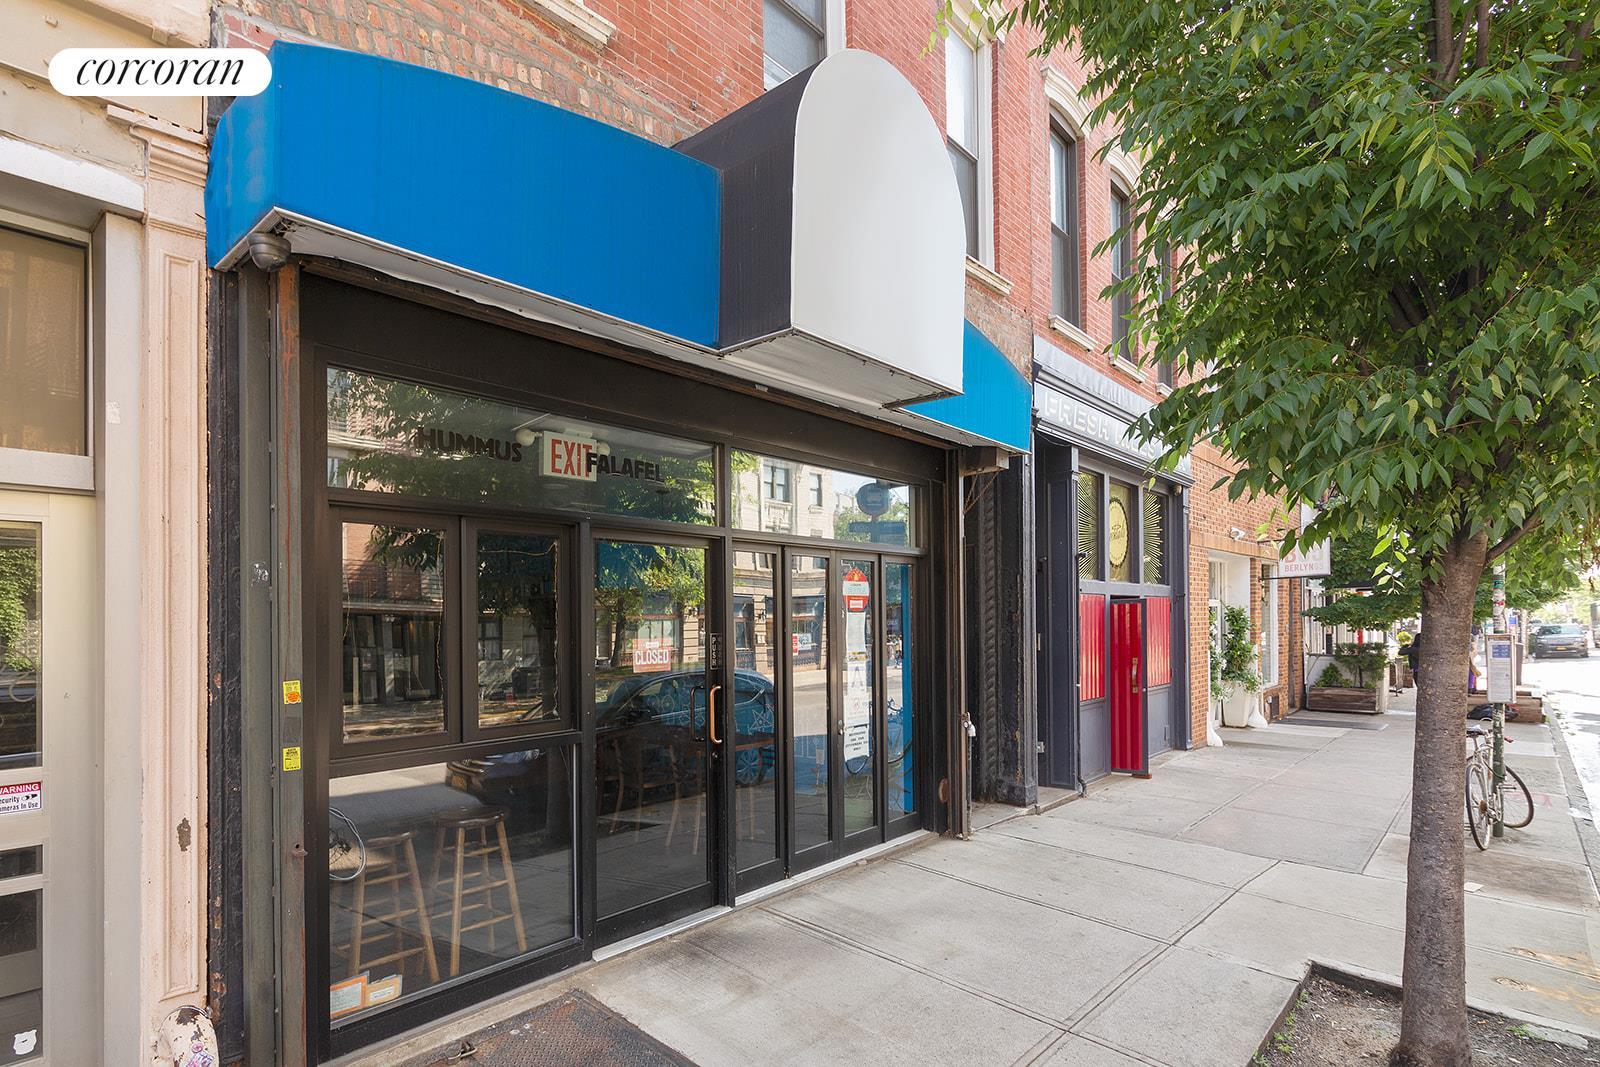 159 Grand Street, Apt 1, Brooklyn, New York 11211